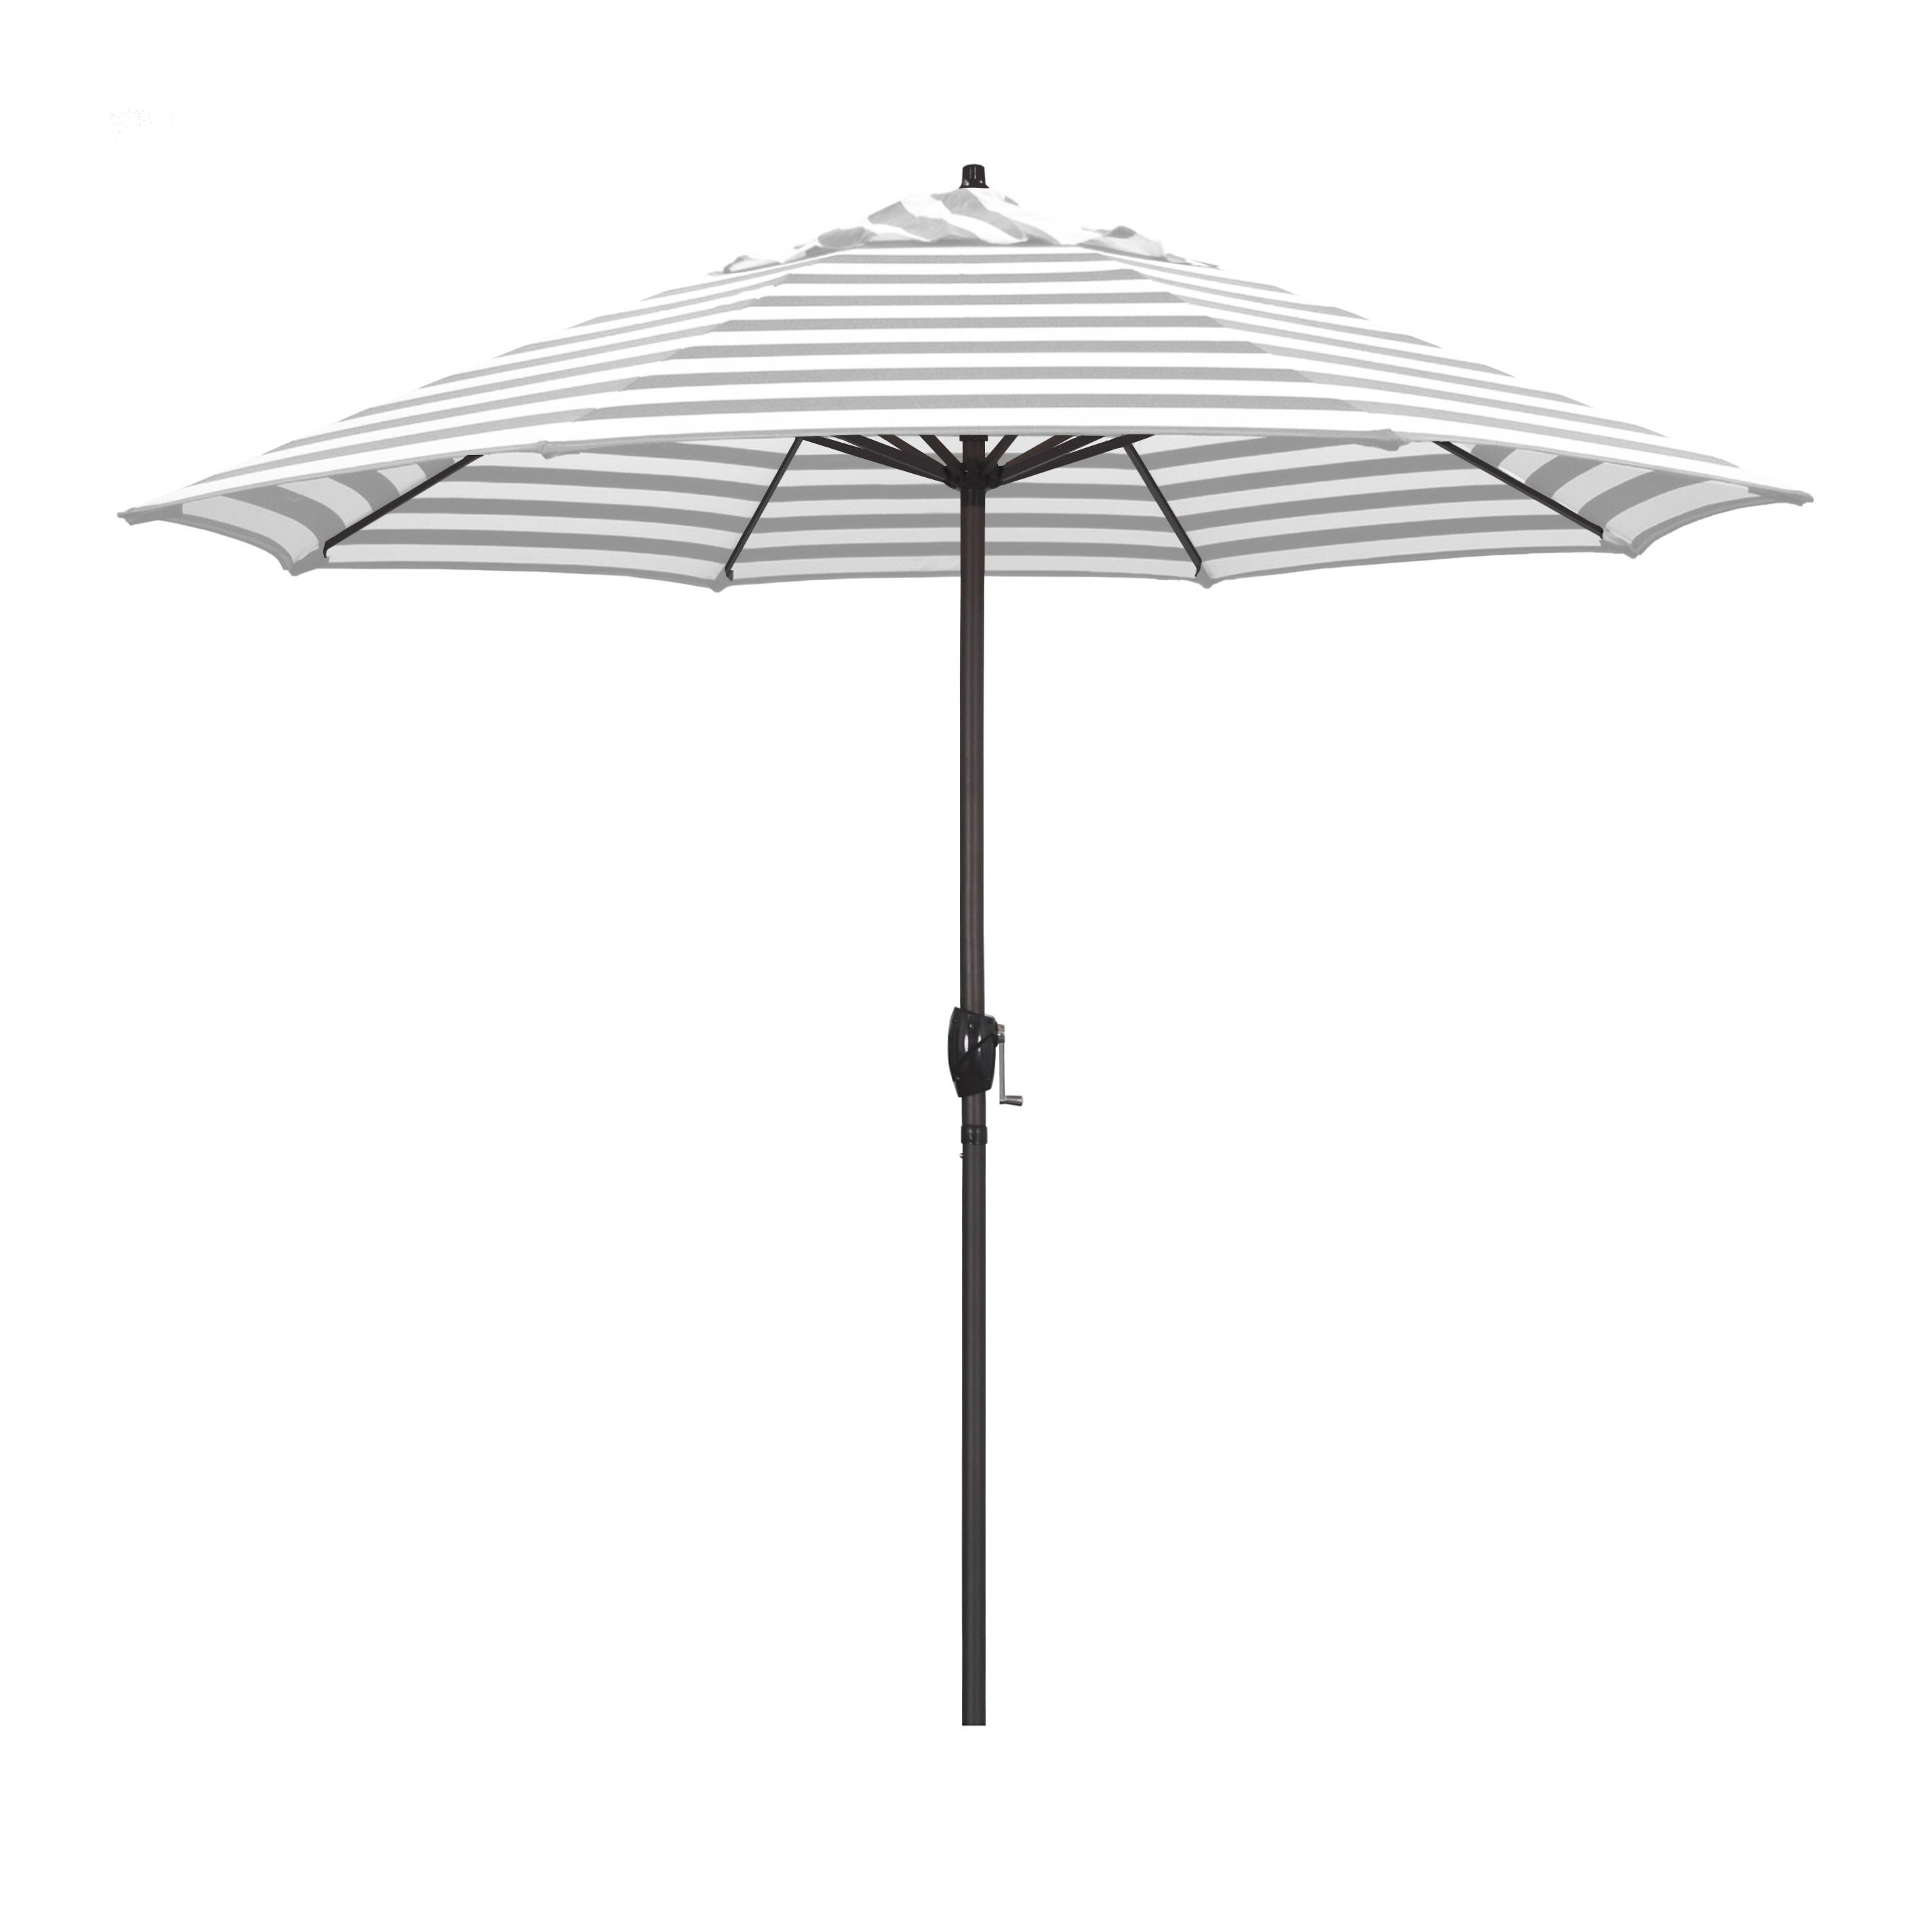 Famous Cardine 9' Market Umbrella Regarding Hapeville Market Umbrellas (View 4 of 20)